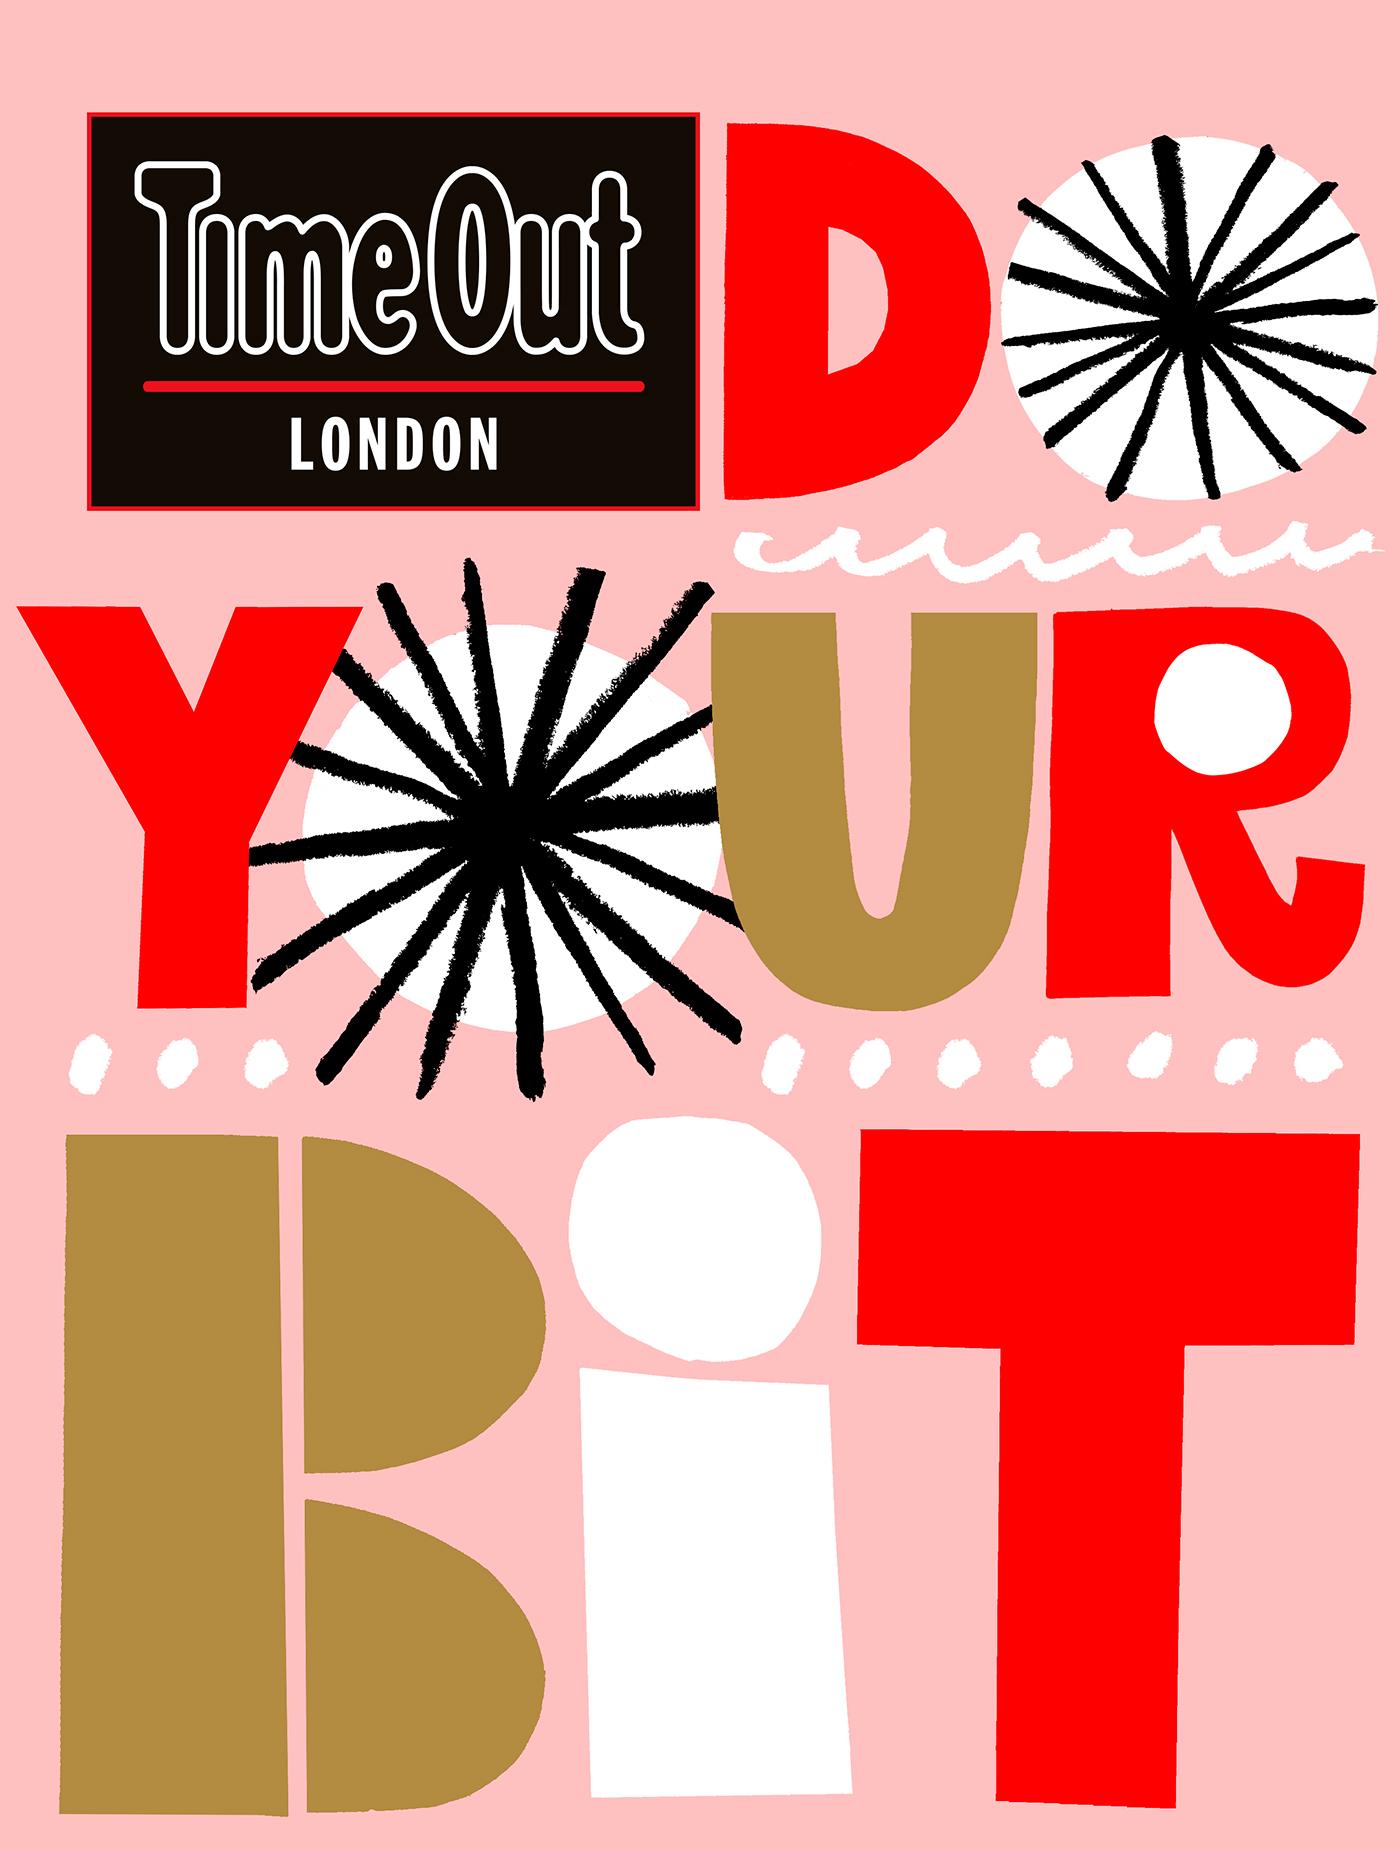 TimeOutCover-do-your-bit-ncc.jpg